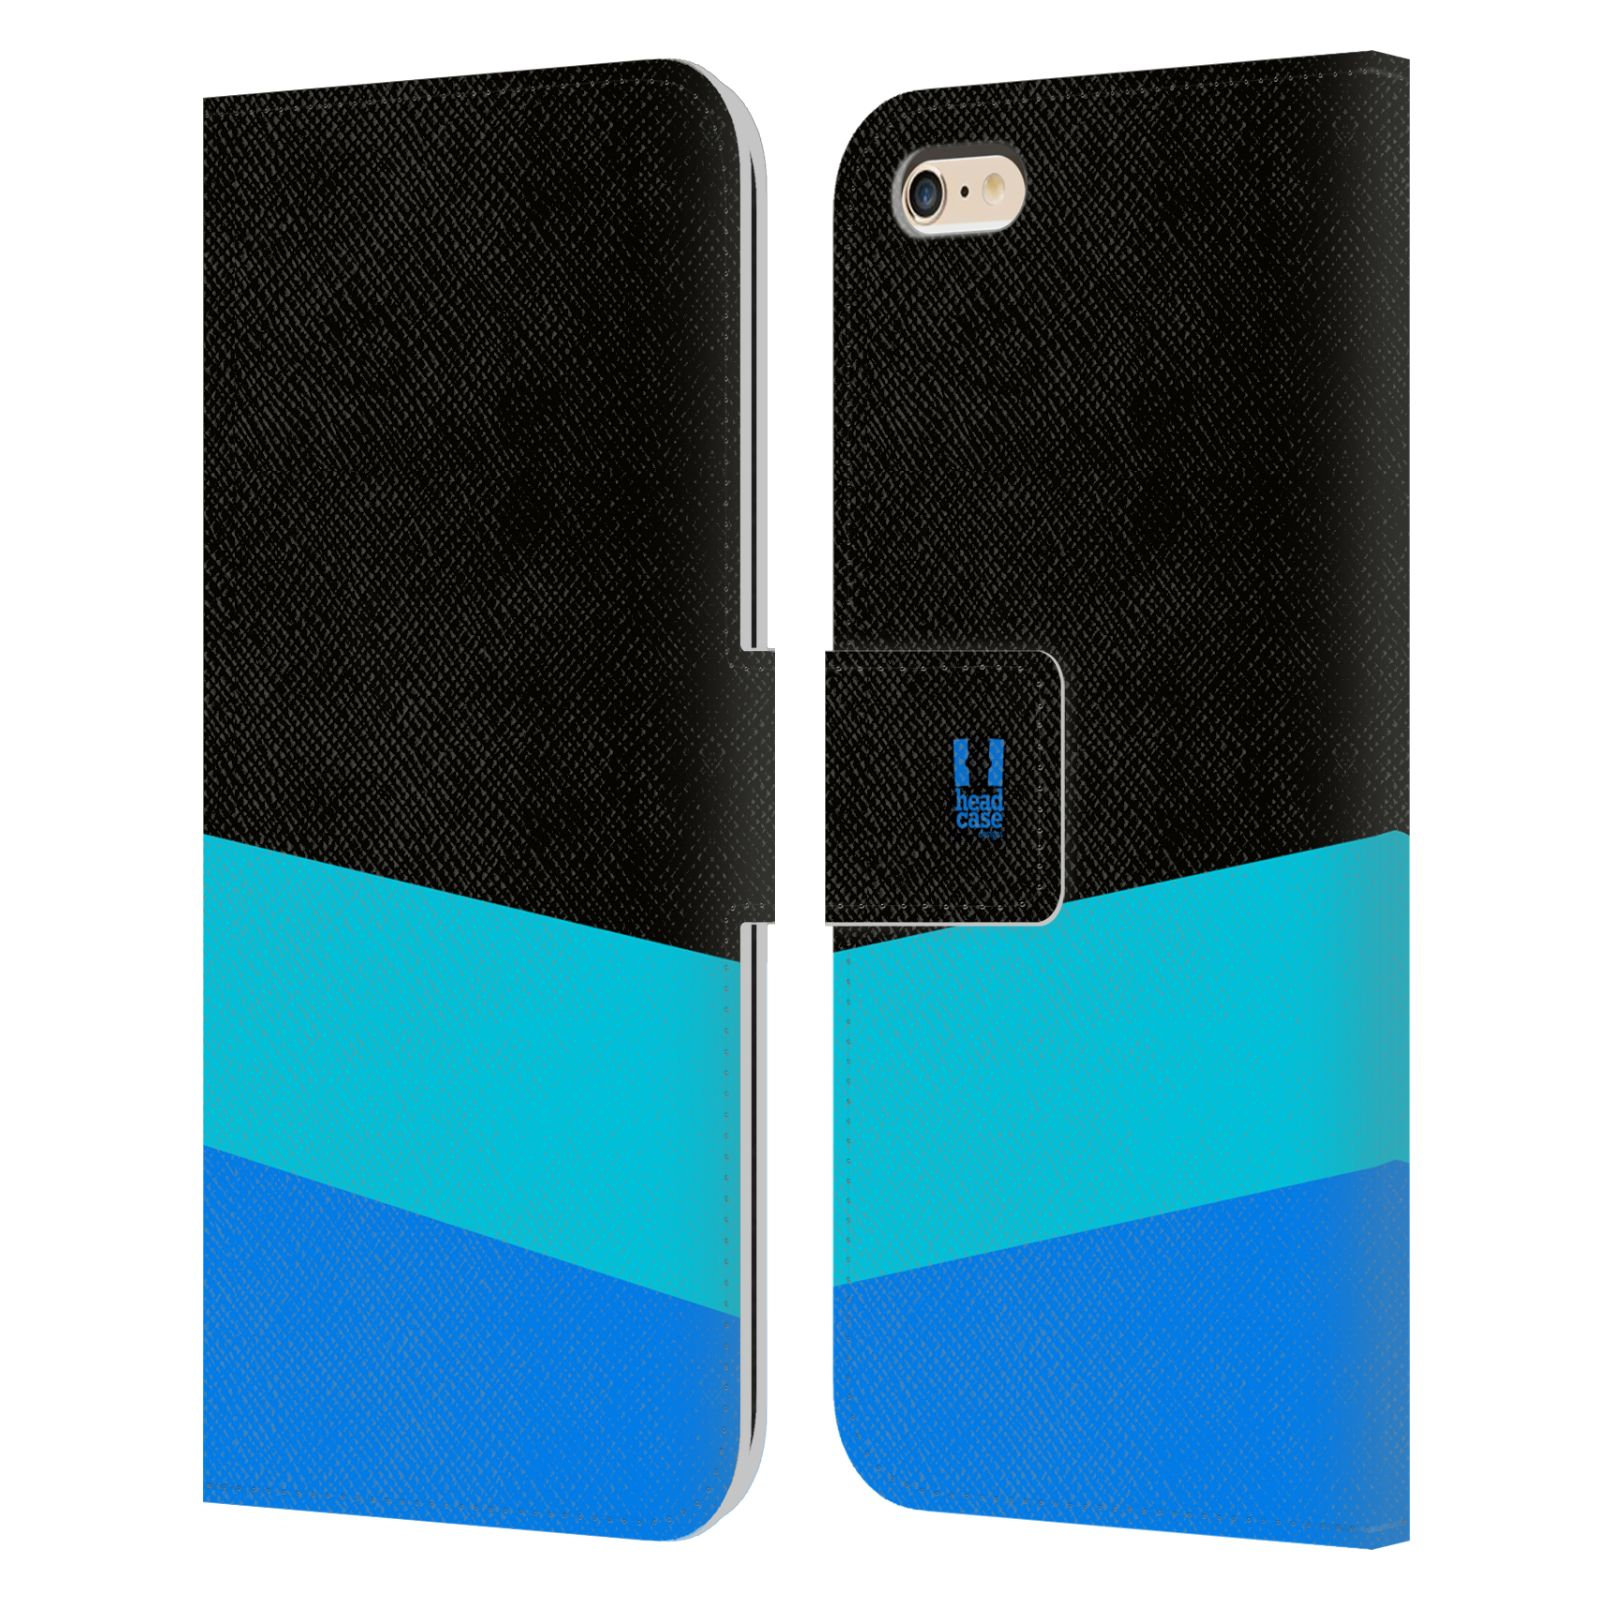 HEAD CASE Flipové pouzdro pro mobil Apple Iphone 6 PLUS/6S PLUS barevné tvary modrá a černá FORMAL